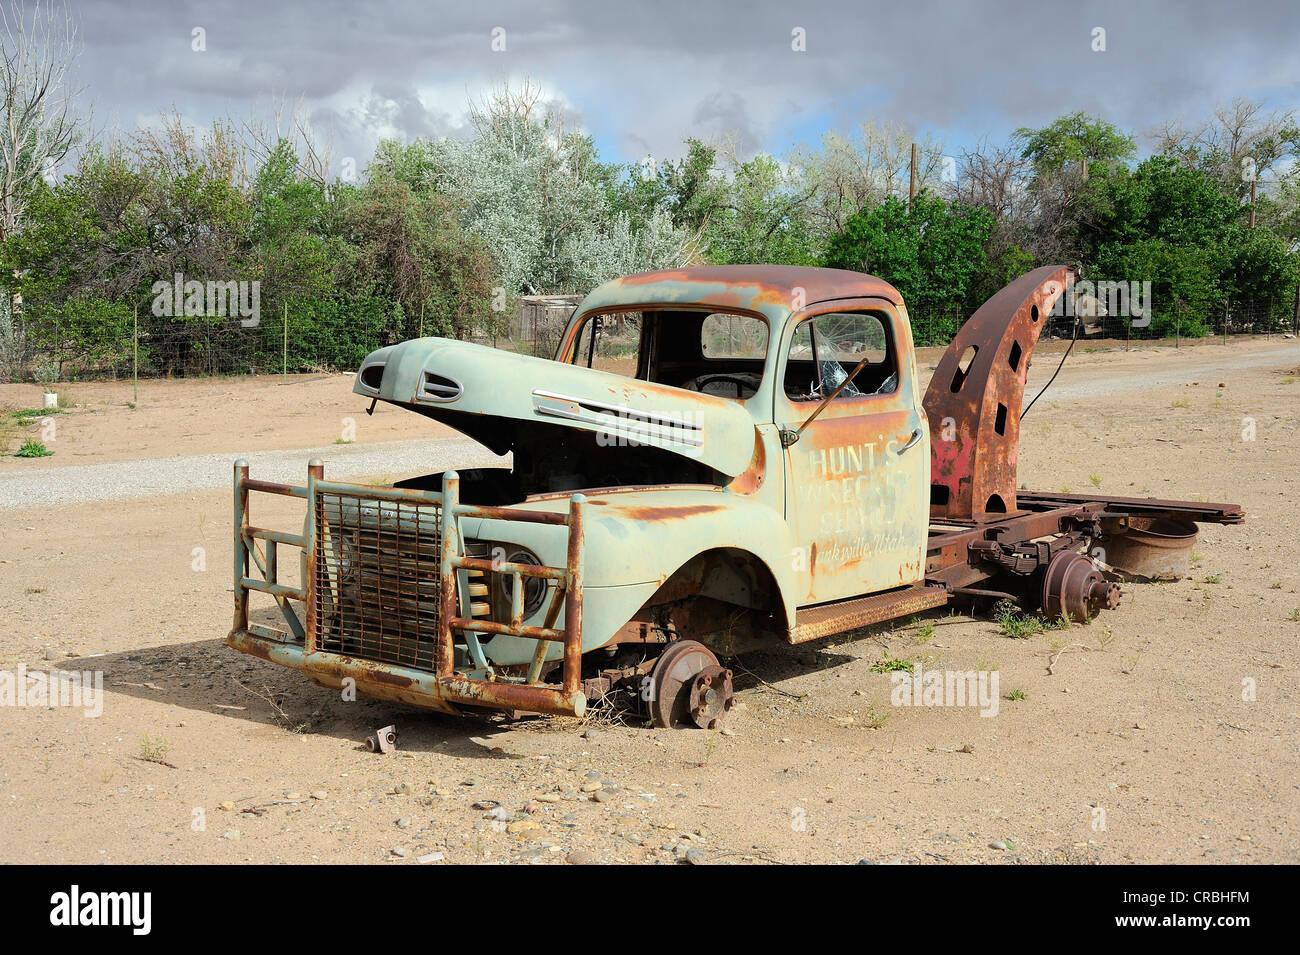 Wreck of a towing car in Hanksville, Utah, USA - Stock Image